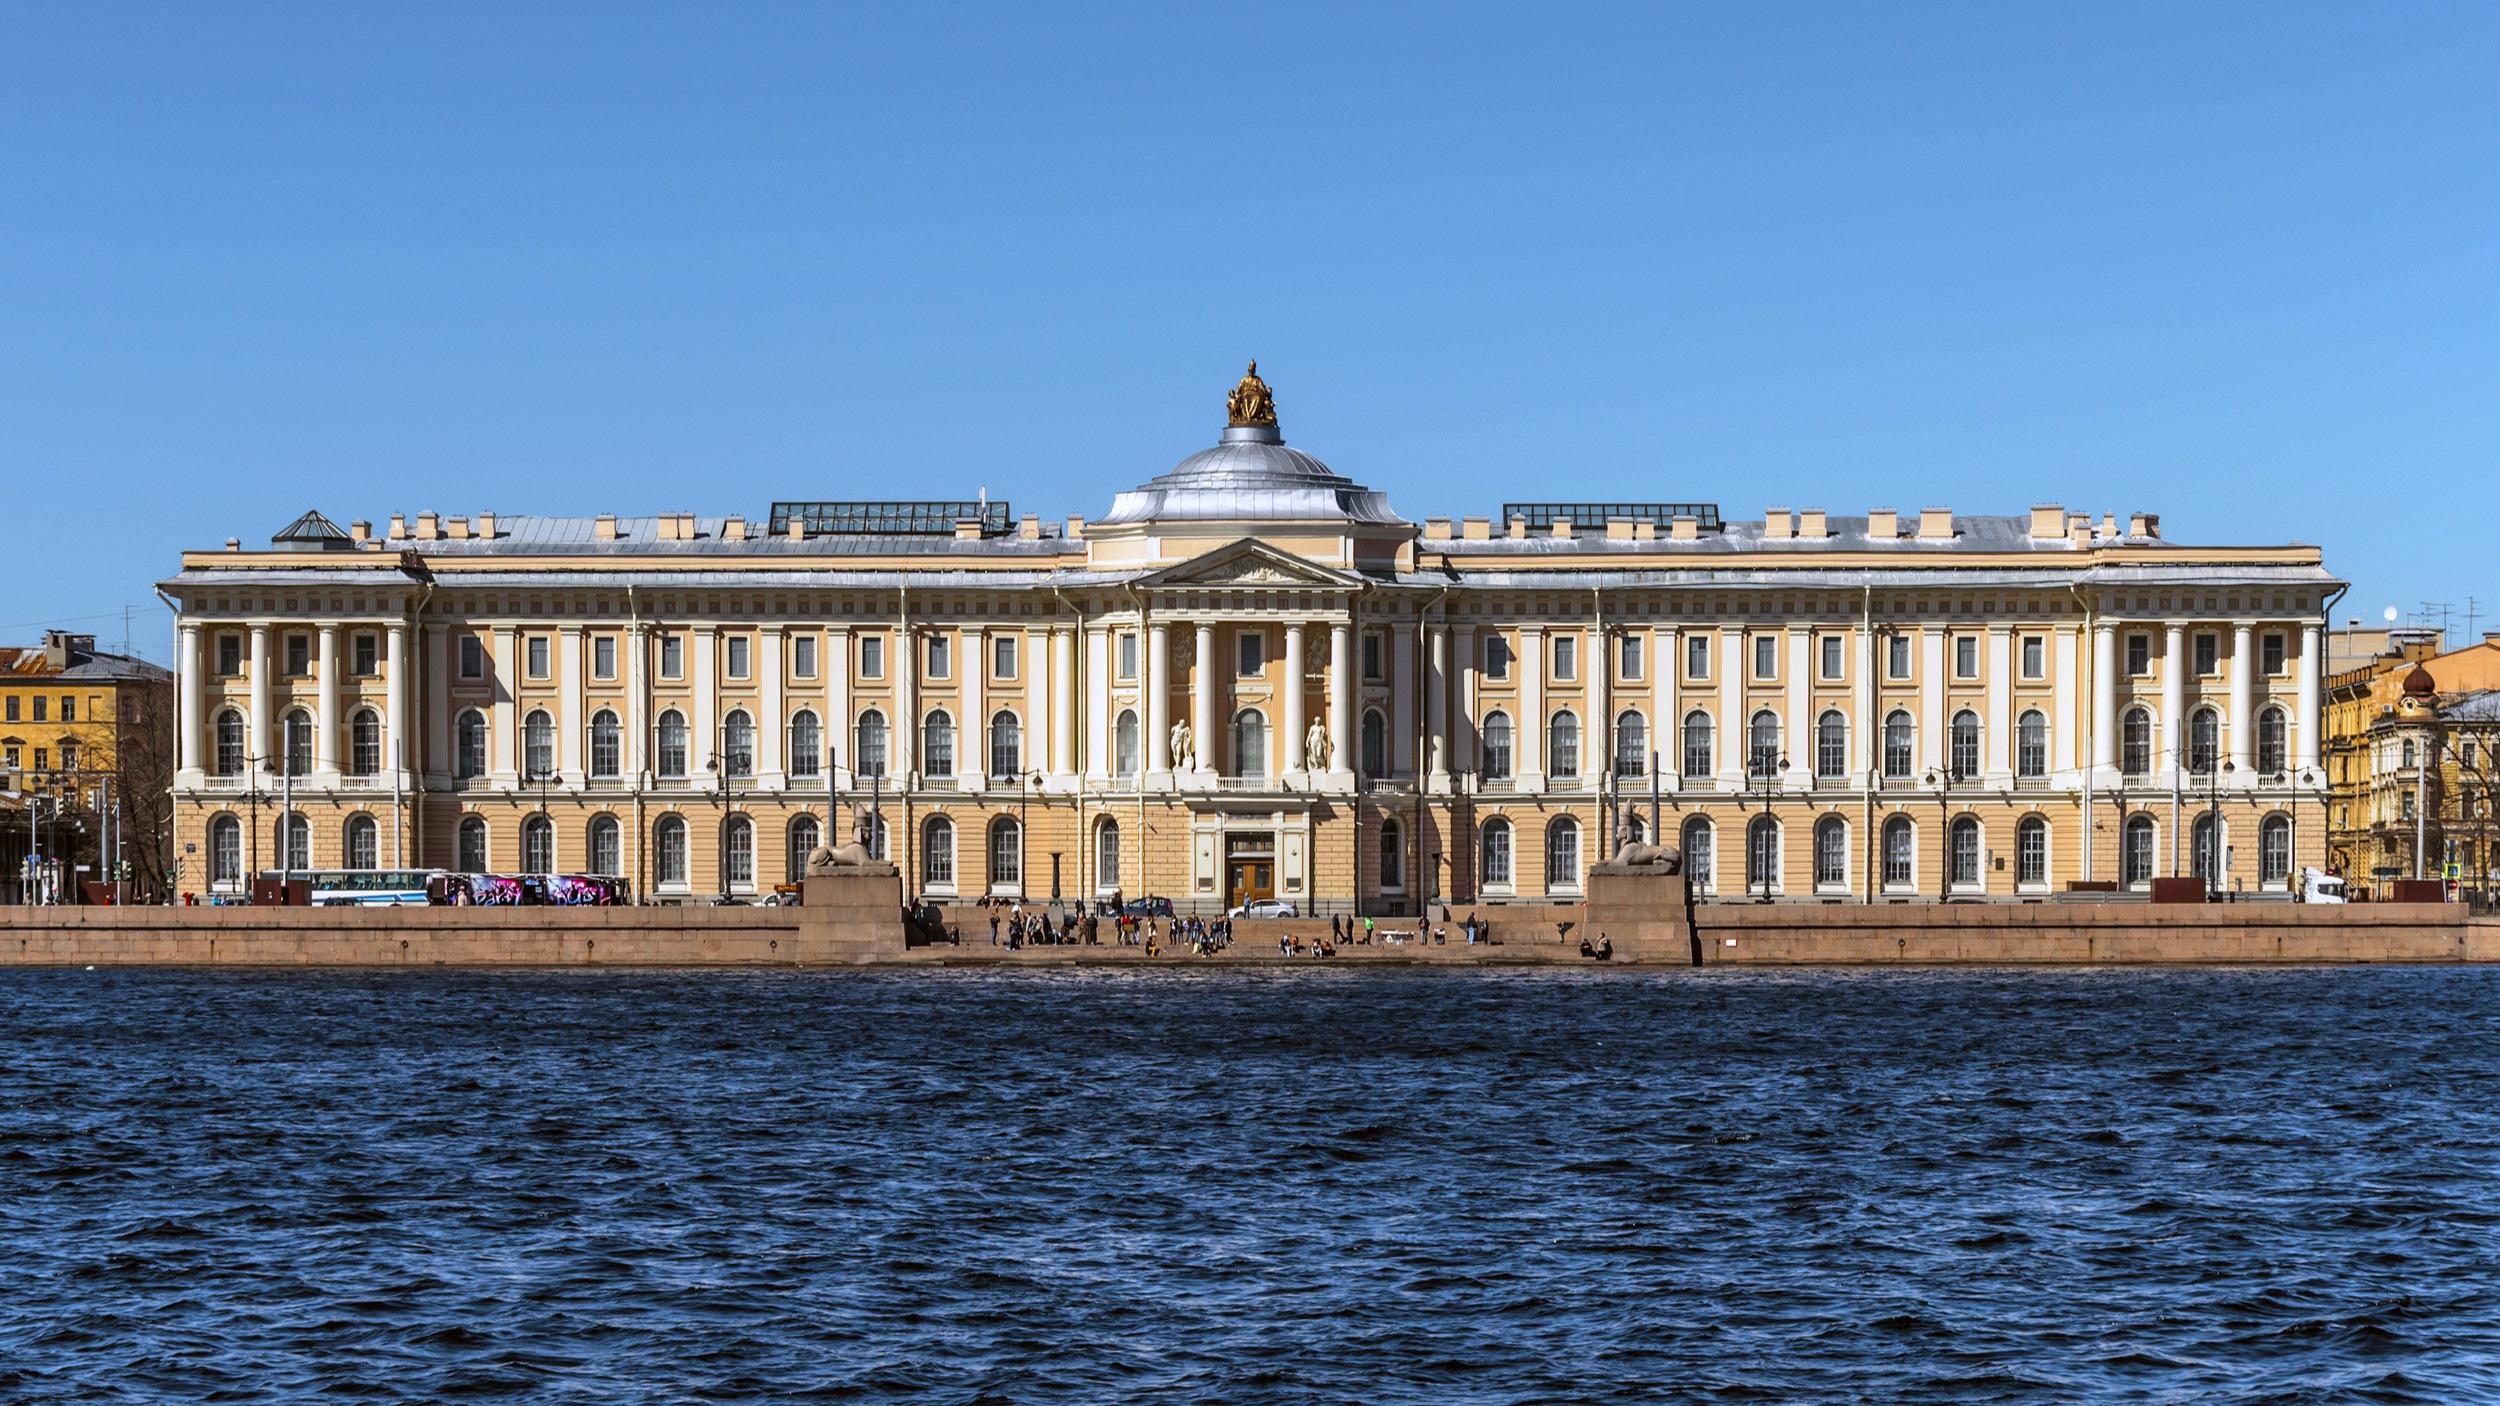 Saint Petersburg Academy of the Arts